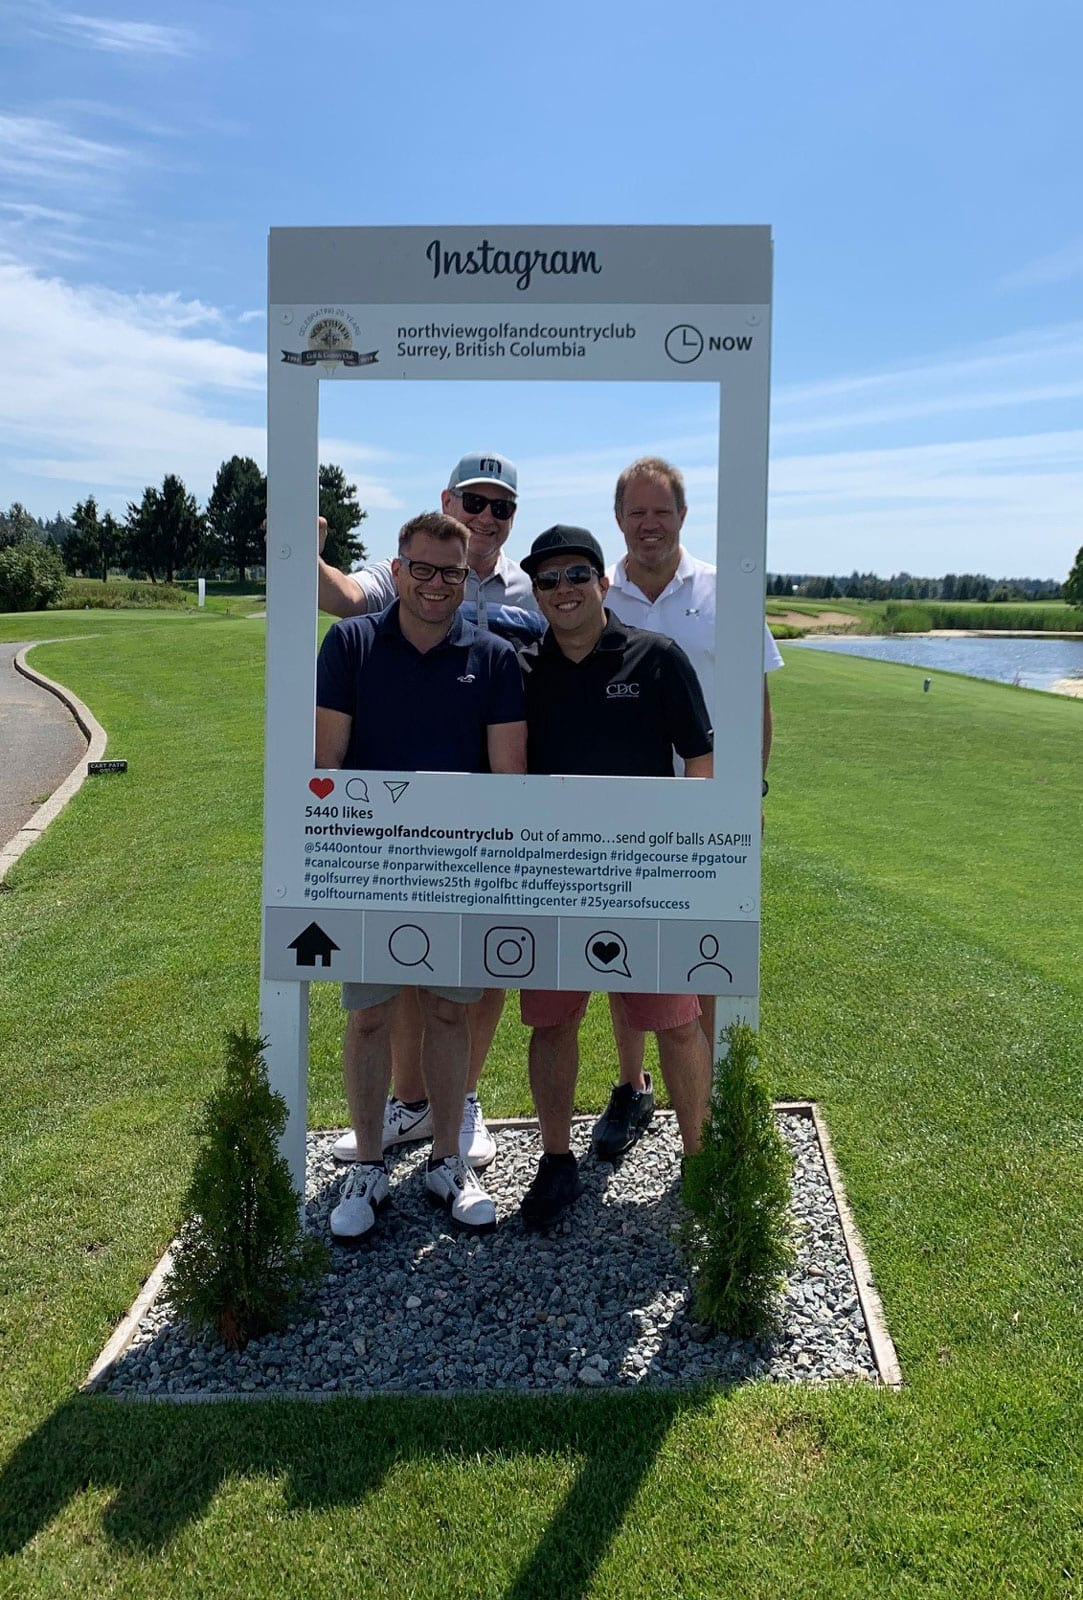 CDC team golfing on a sunny day